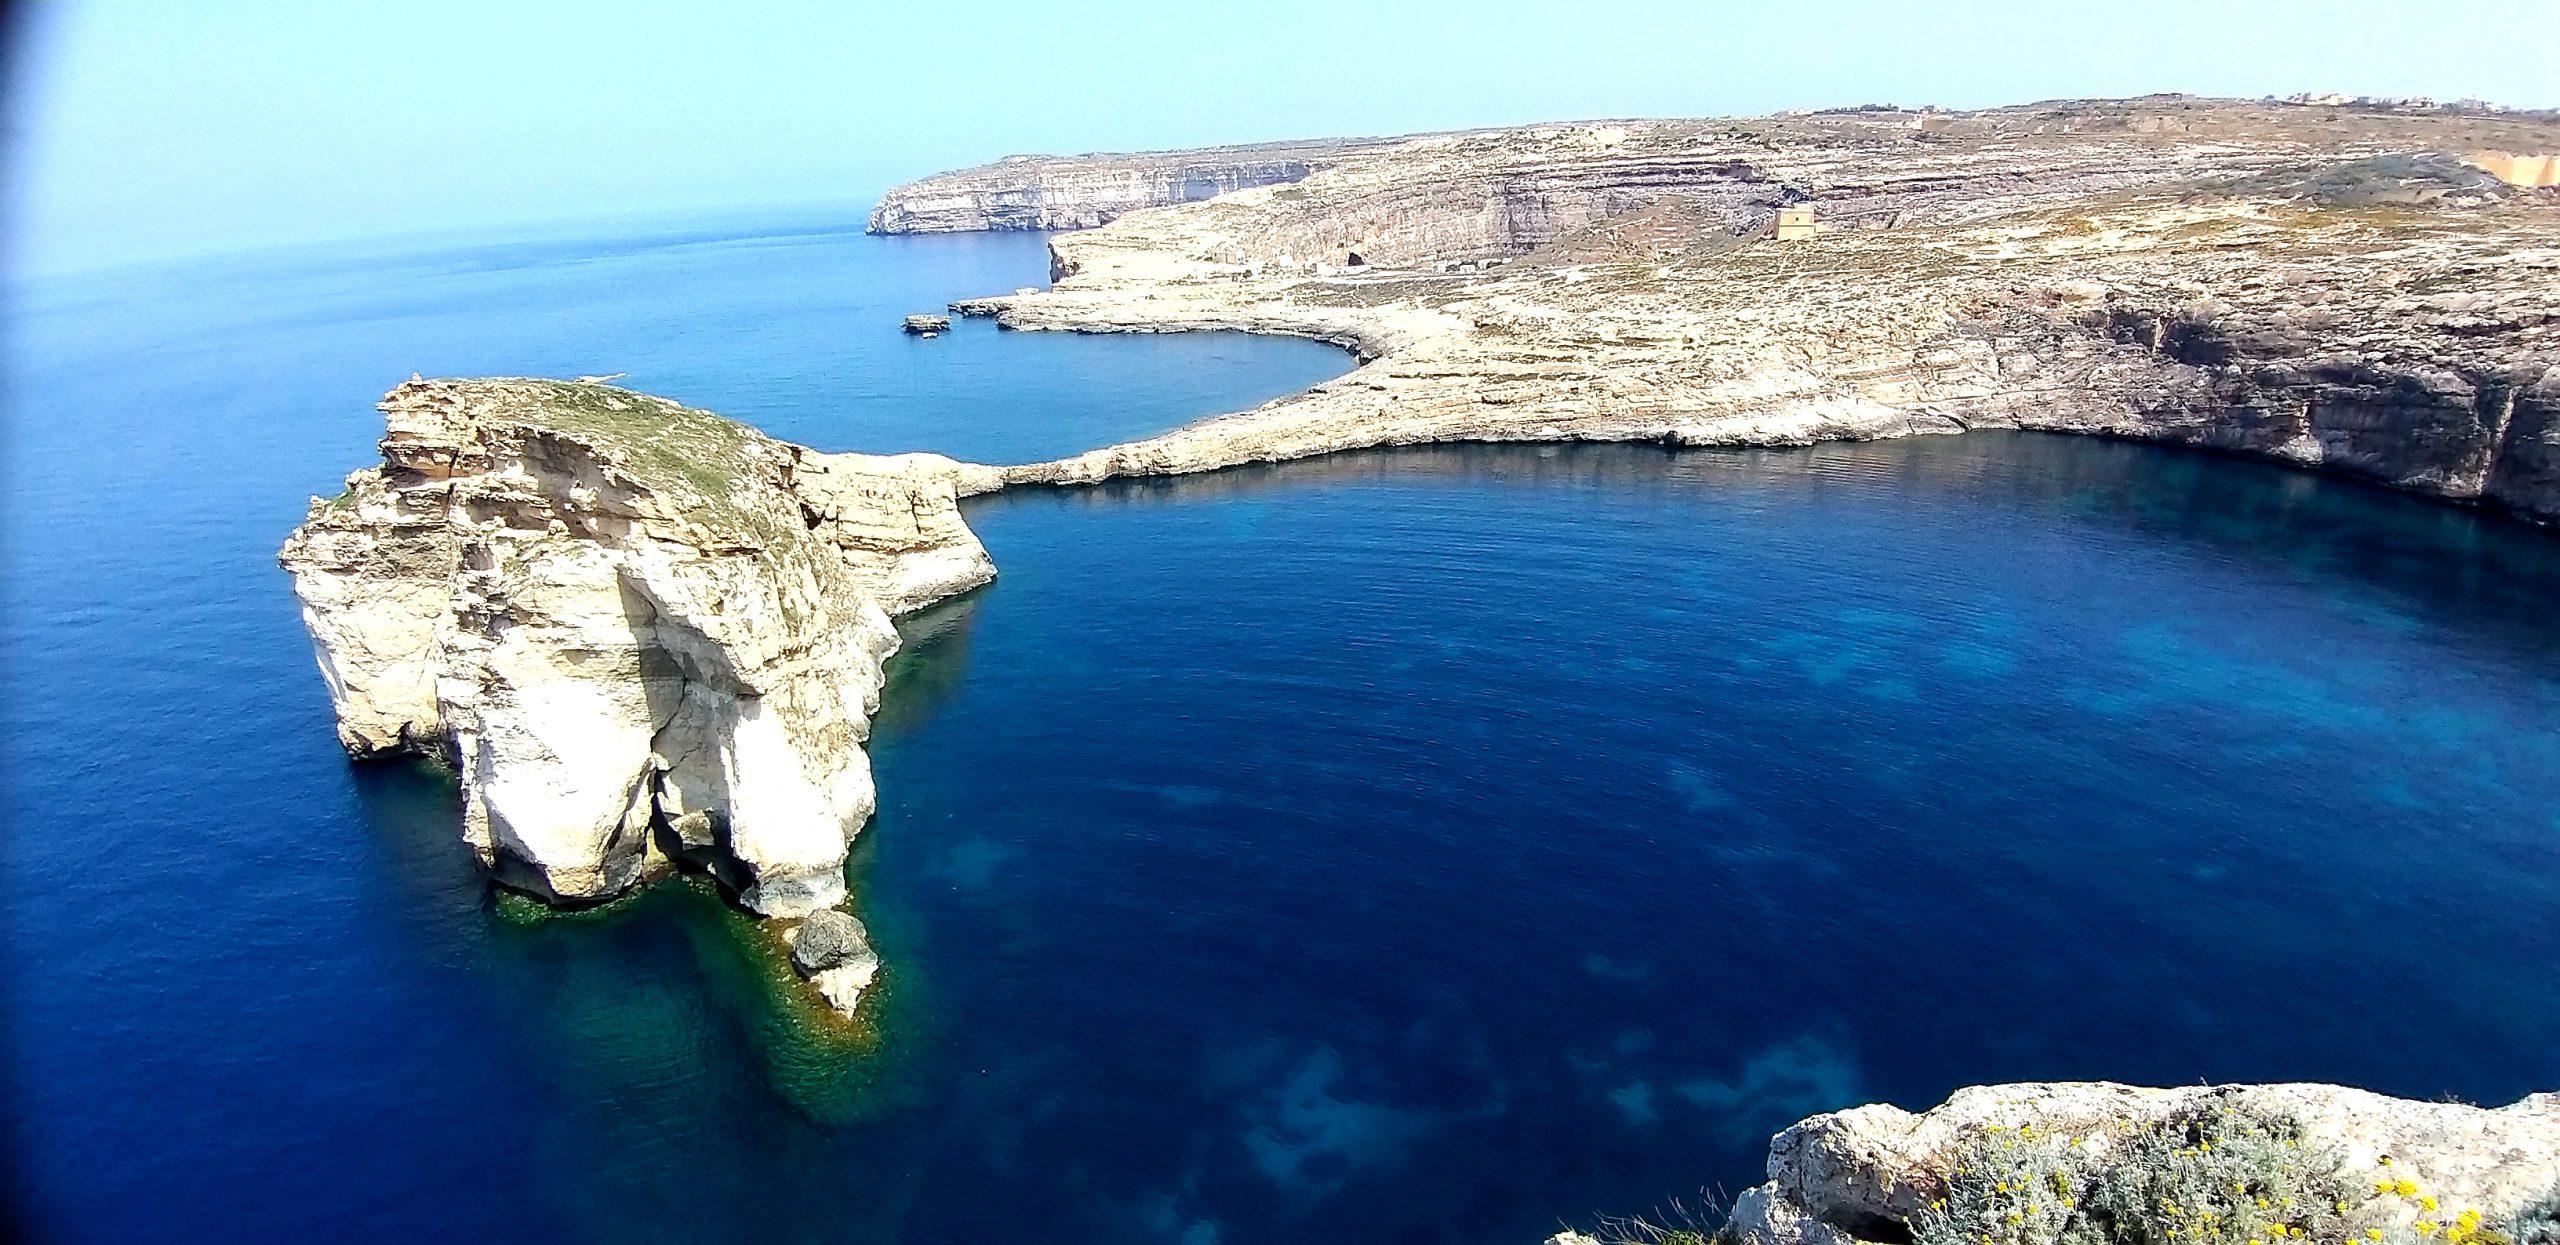 OUTDOOR EXPLORER MALTA GOZO COMINO hikes in gozo island